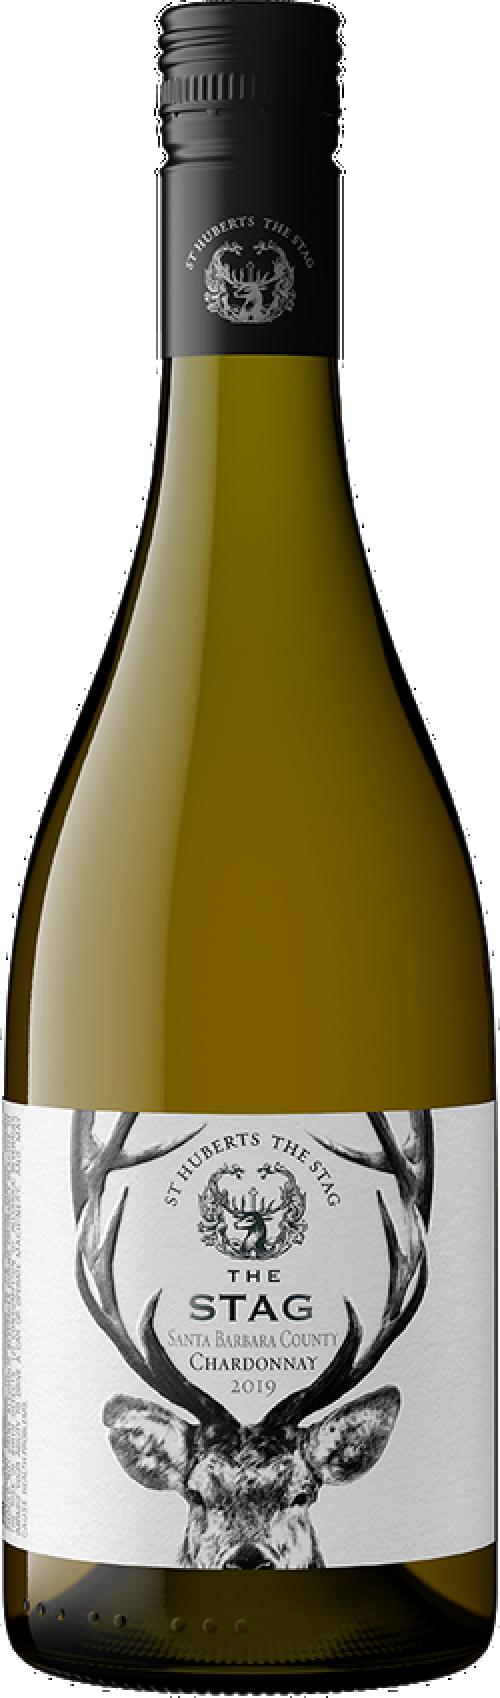 The Stag Chardonnay Santa Barbara 750ml